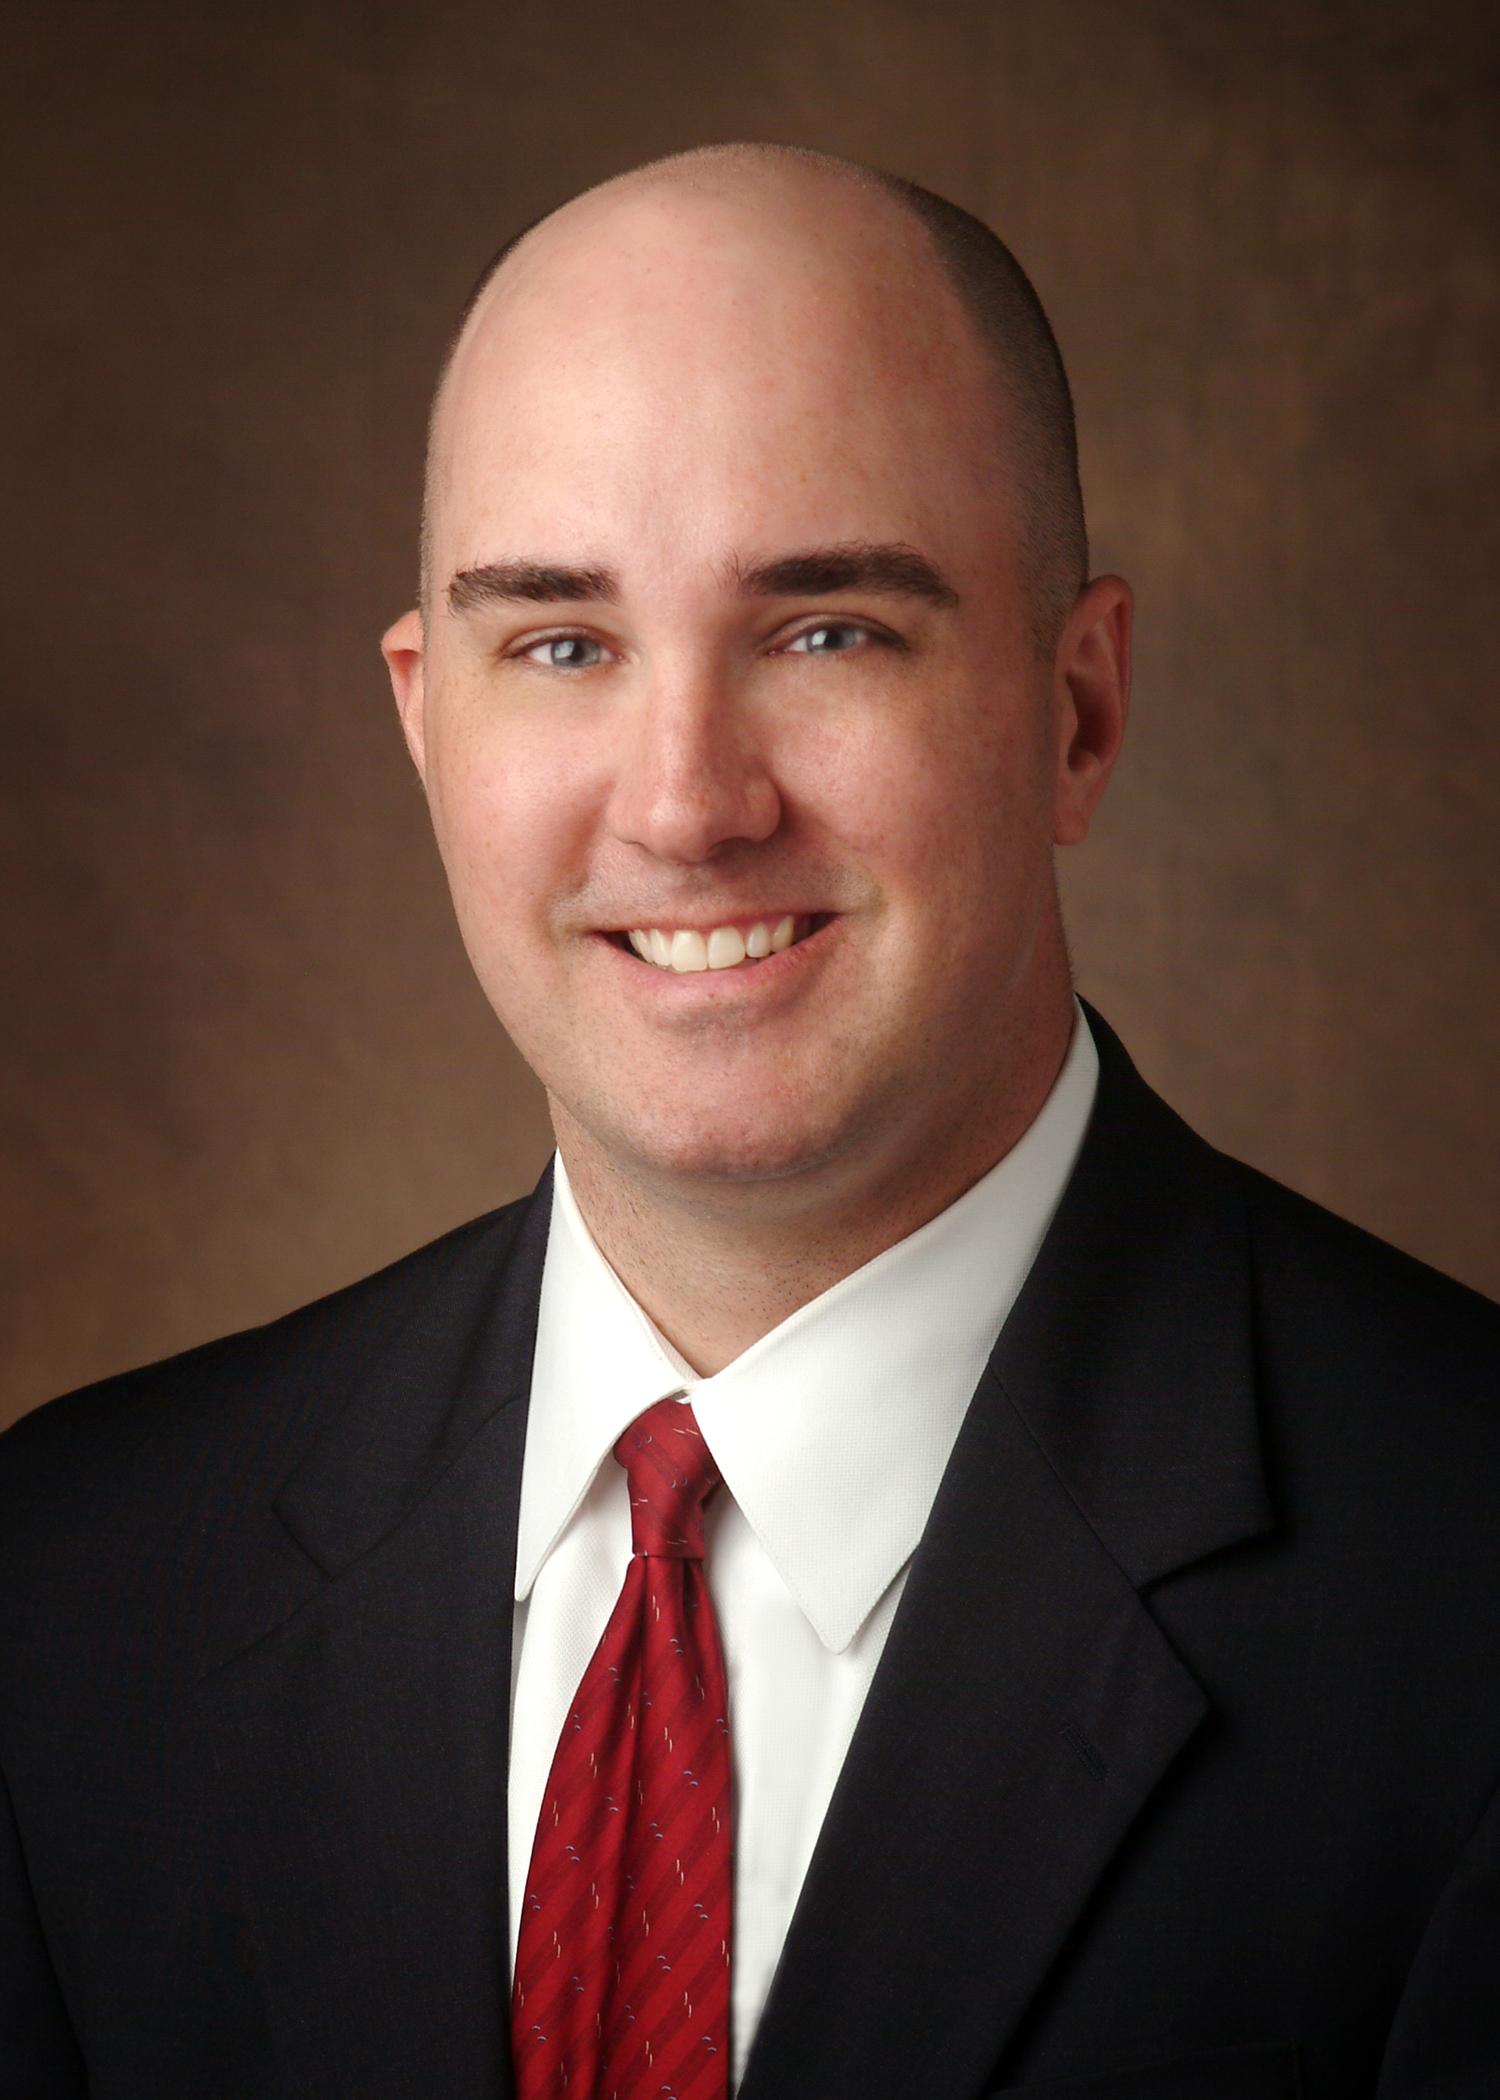 Charles West, financial advisor Cary NC